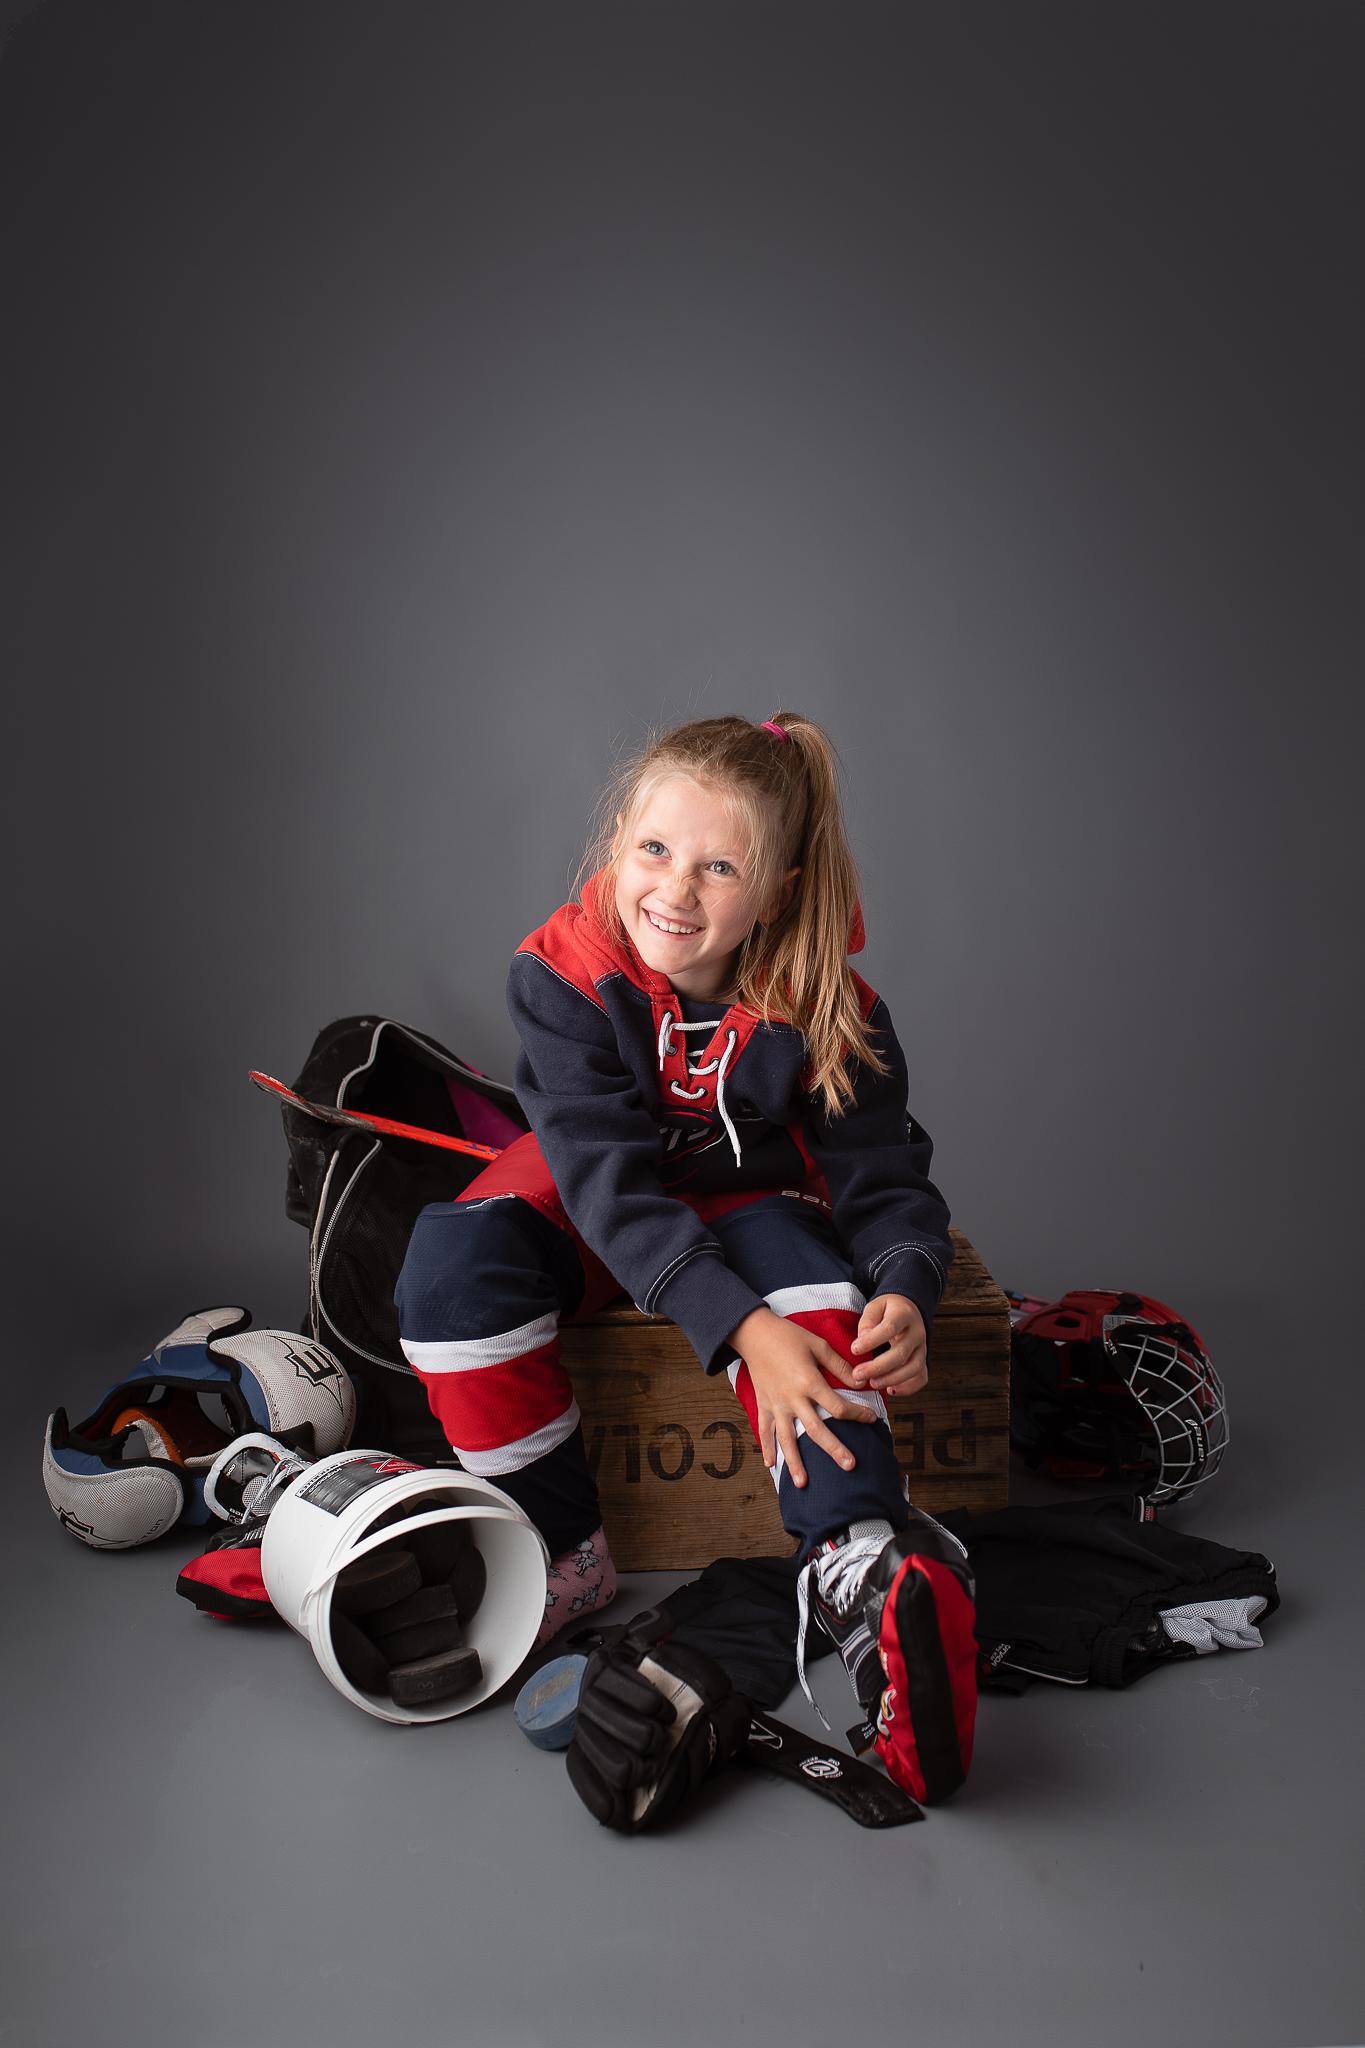 Naomi Lucienne Peterborough Photography Portrait Photography Children Photography Family Photography-19.jpg